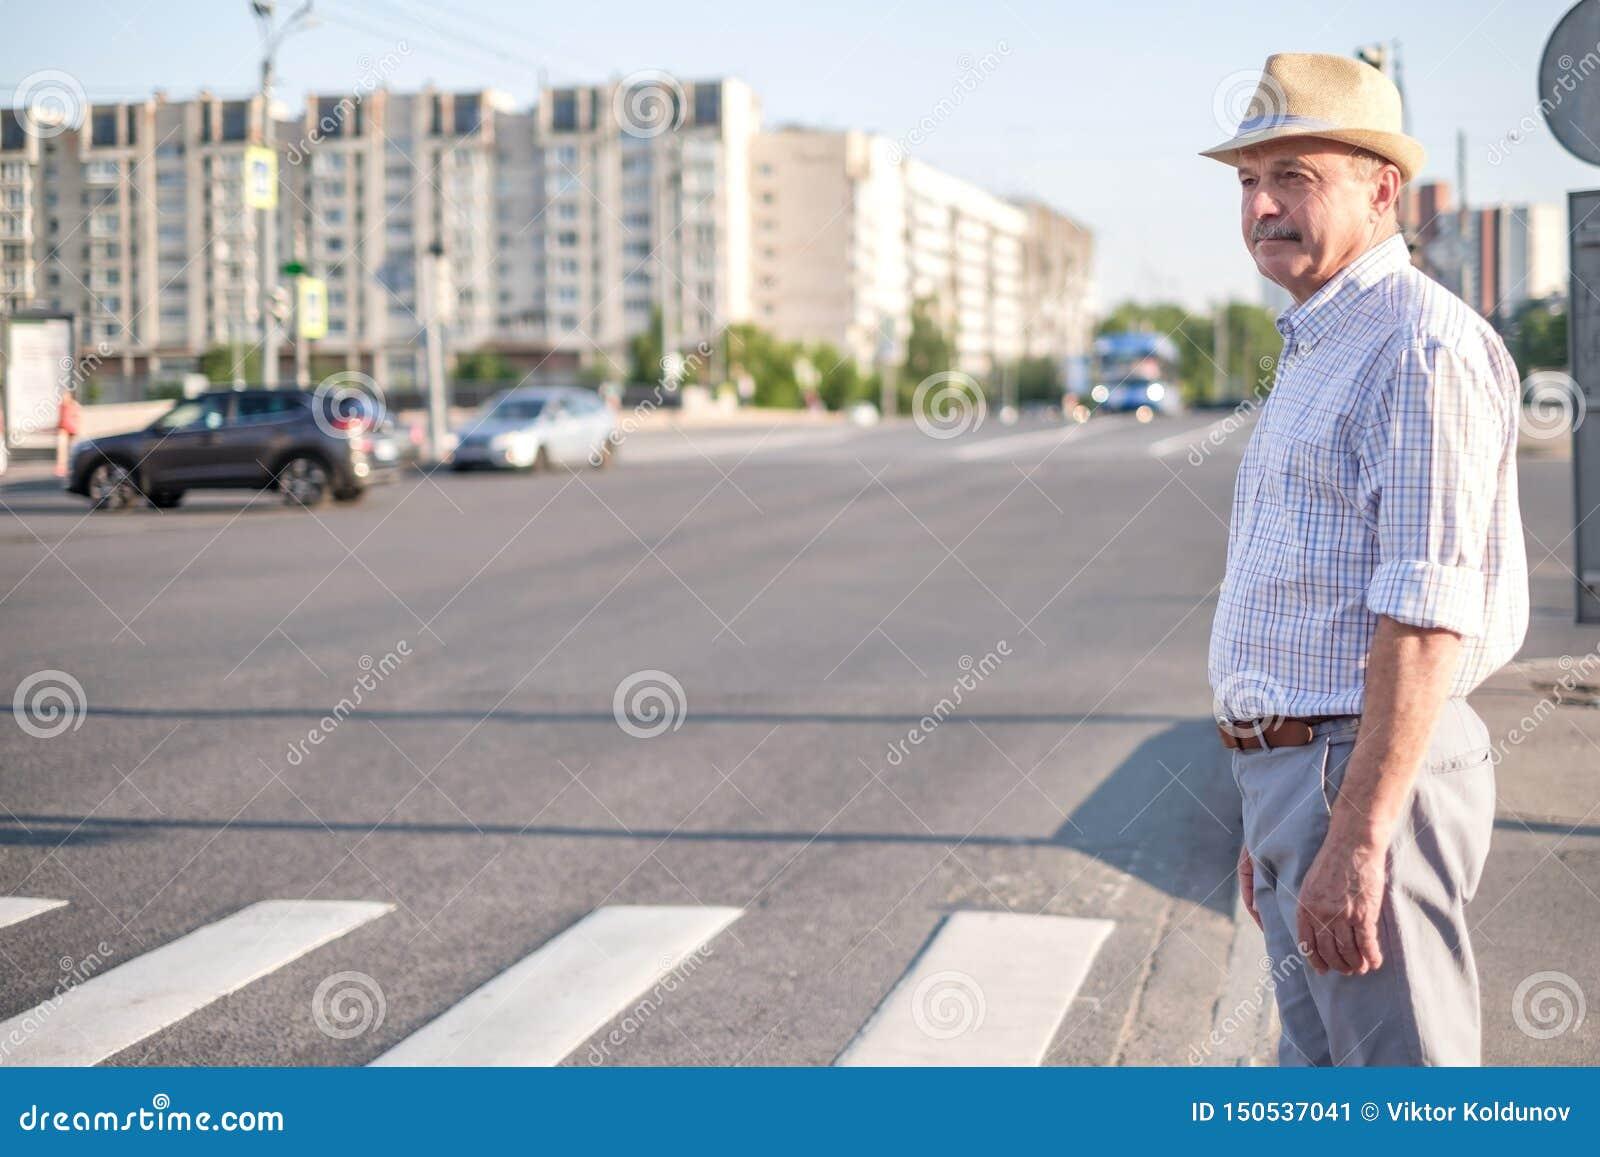 Mature european man waiting to cross street